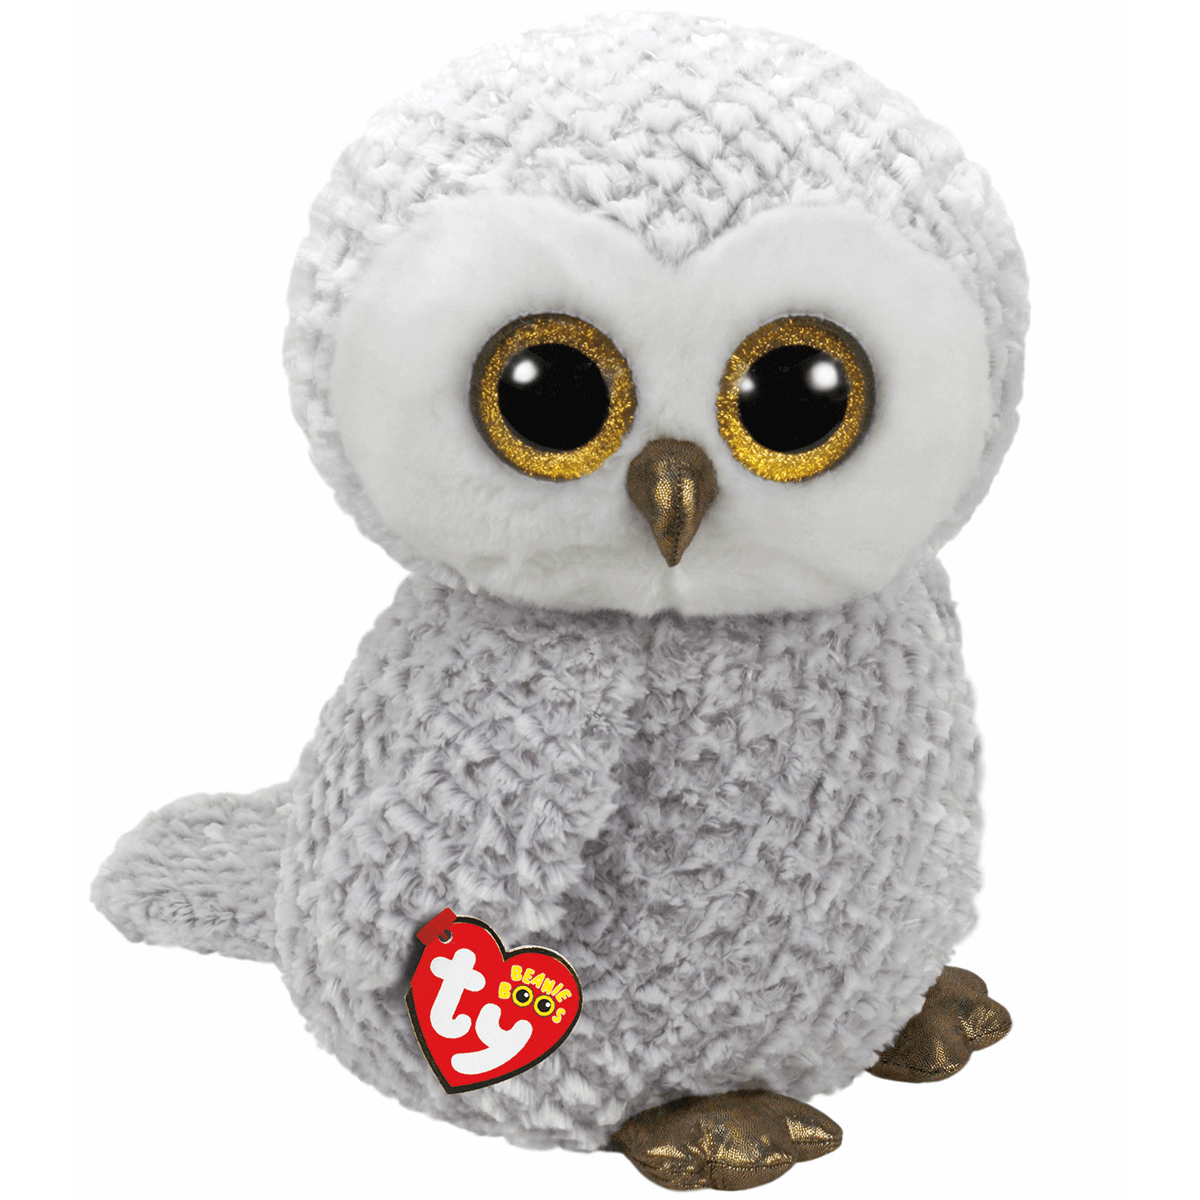 880226ddc0c Ty Large Beanie Boo   Owlette